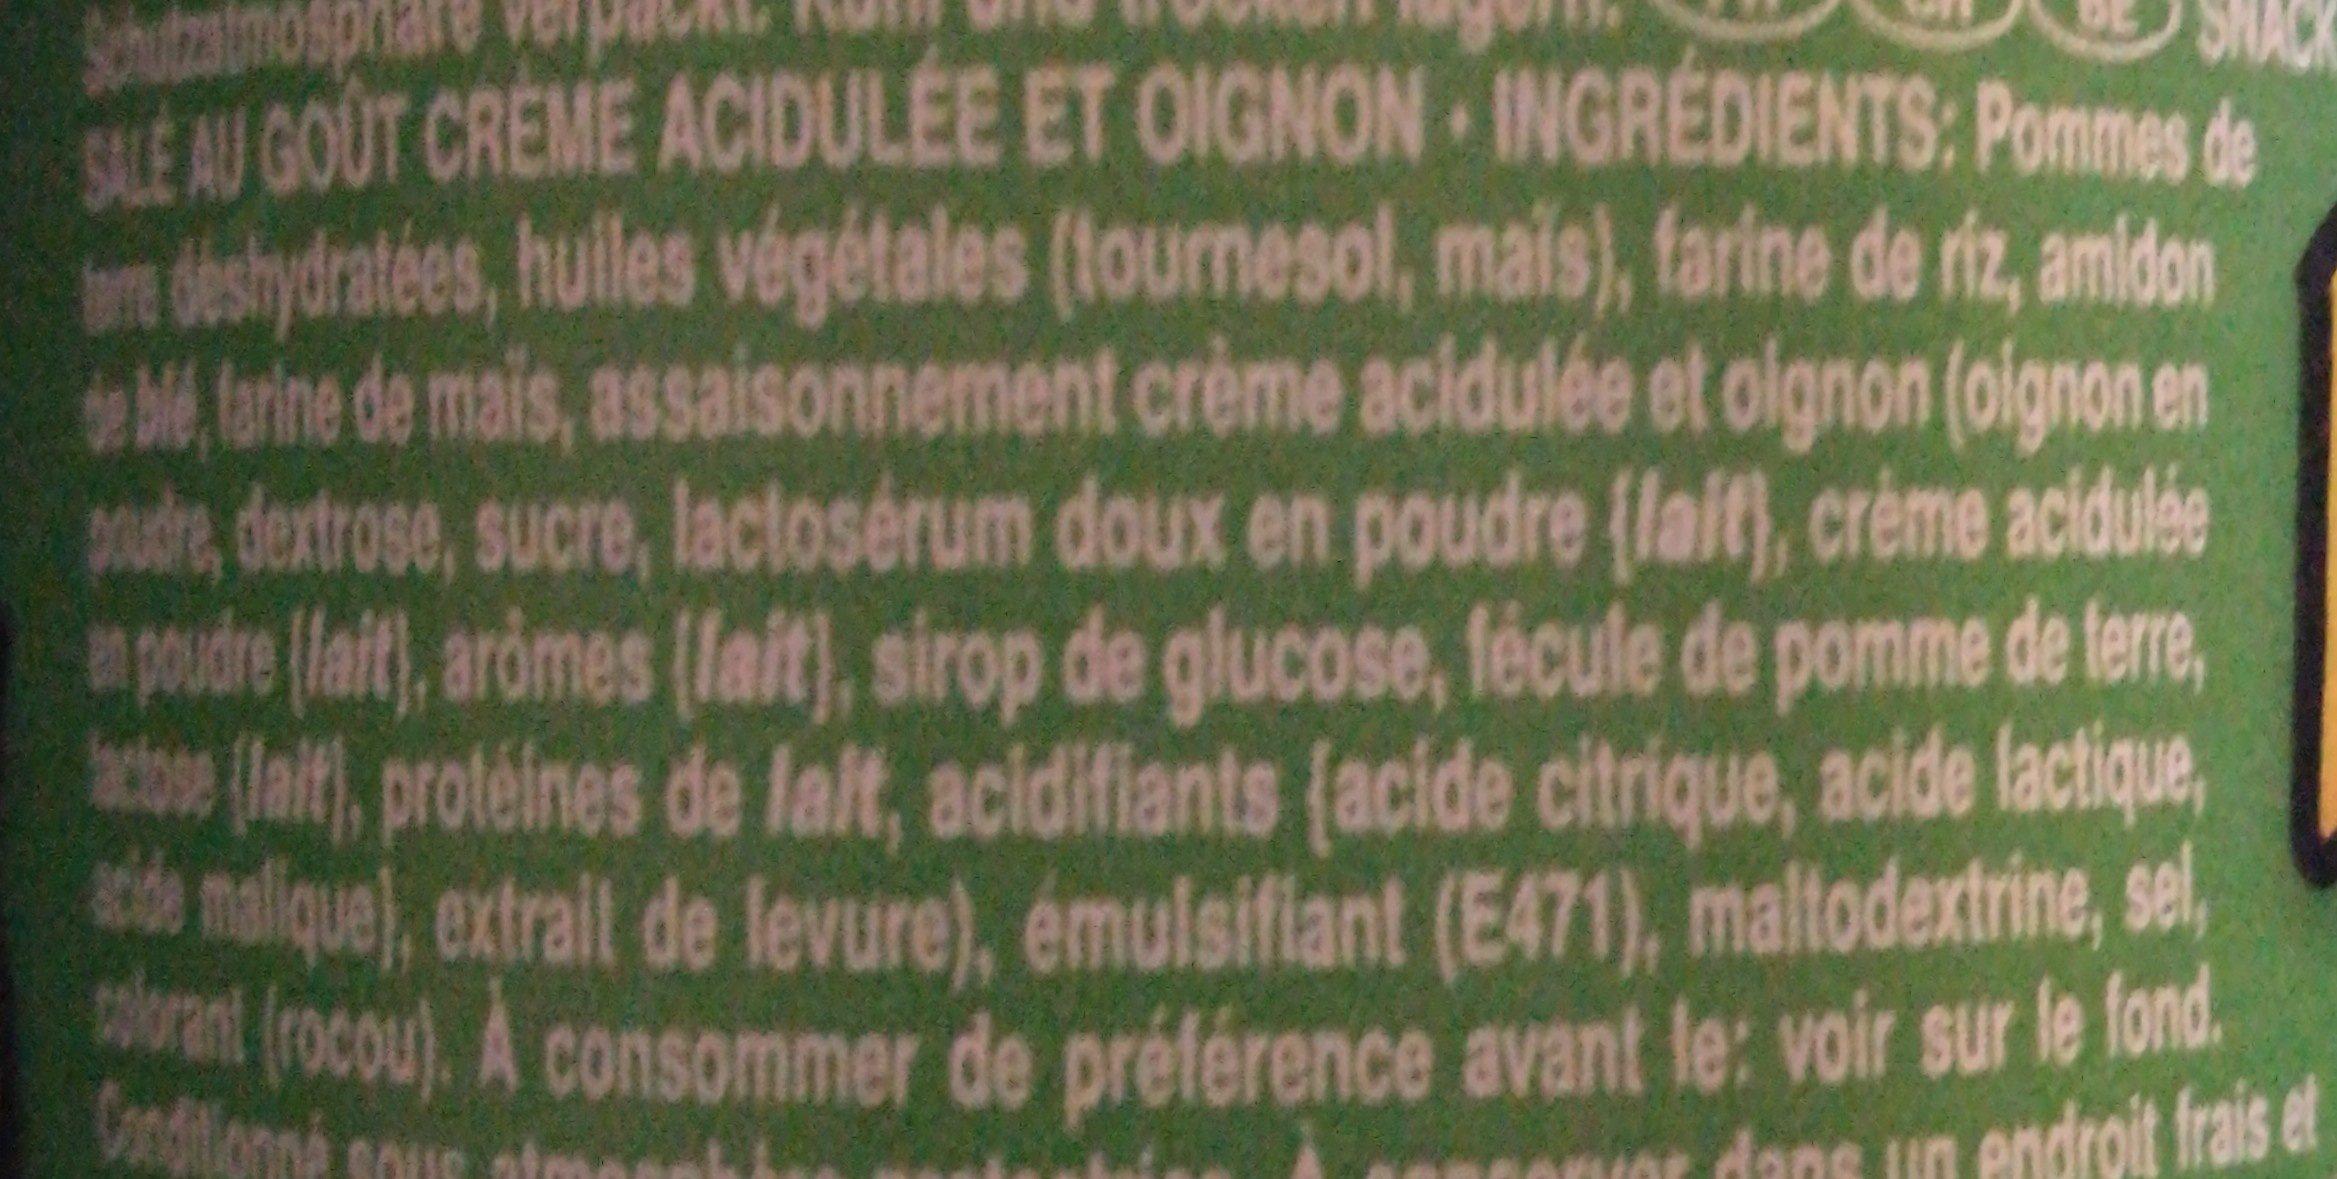 Snack salé goût crème acidulée et oignon - Ingredienti - fr